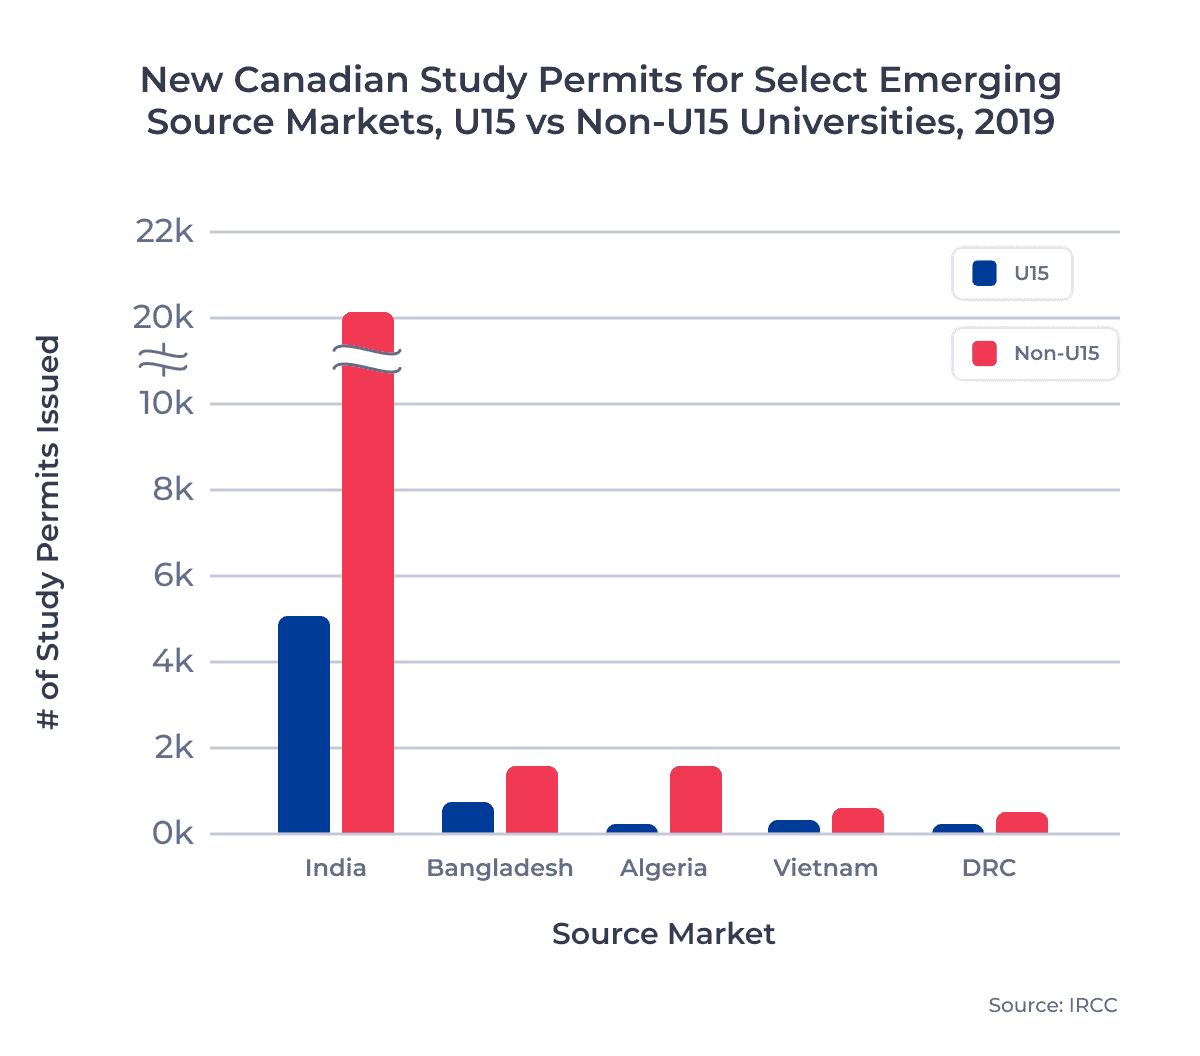 New Canadian Study Permits for Select Emerging Source Markets, U15 vs Non-U15 Universities, 2019